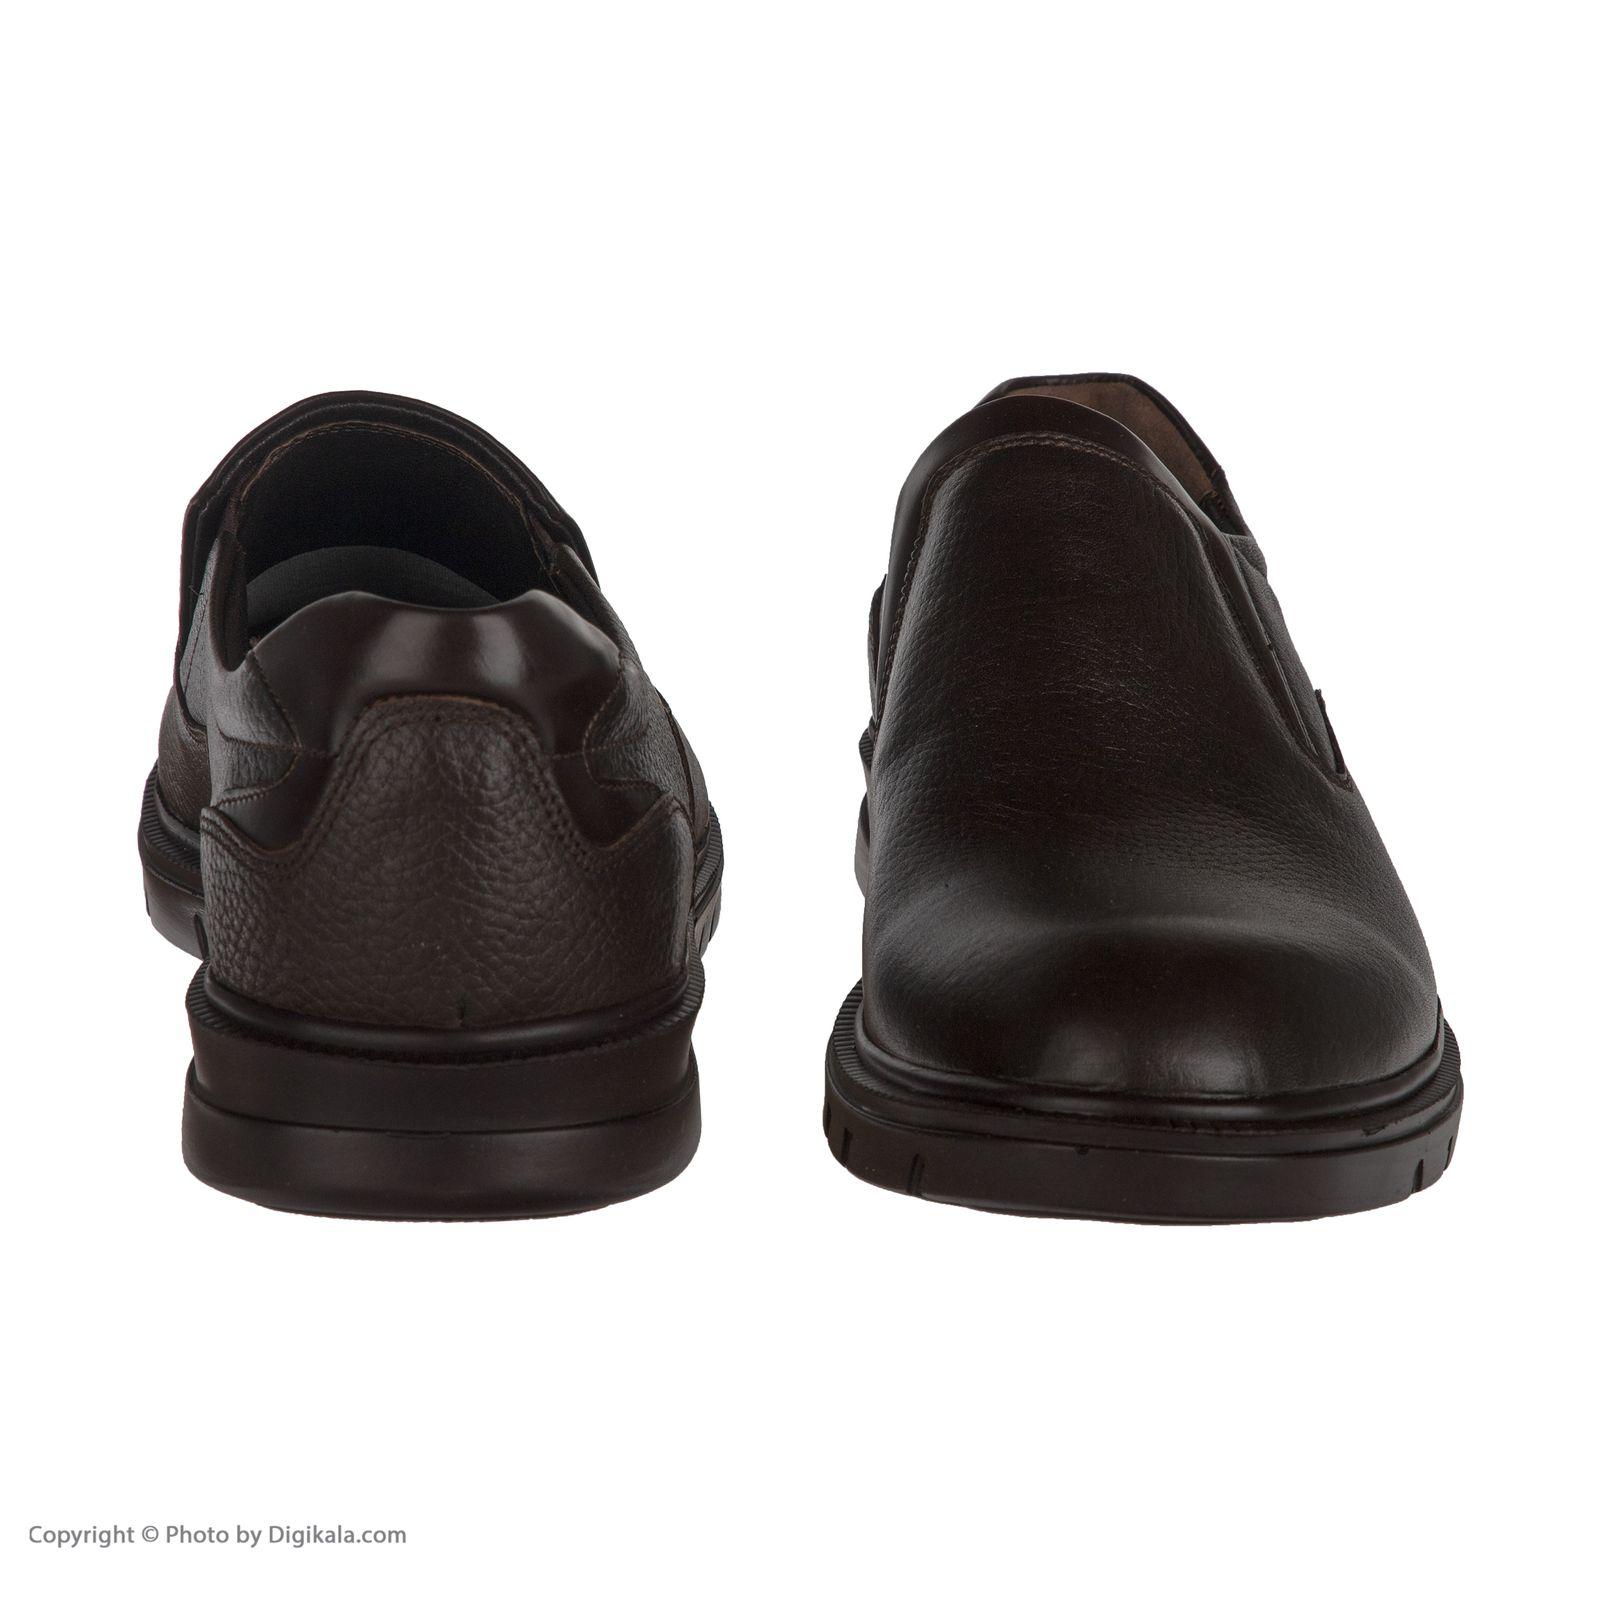 کفش روزمره مردانه بلوط مدل 7240C503104 -  - 5